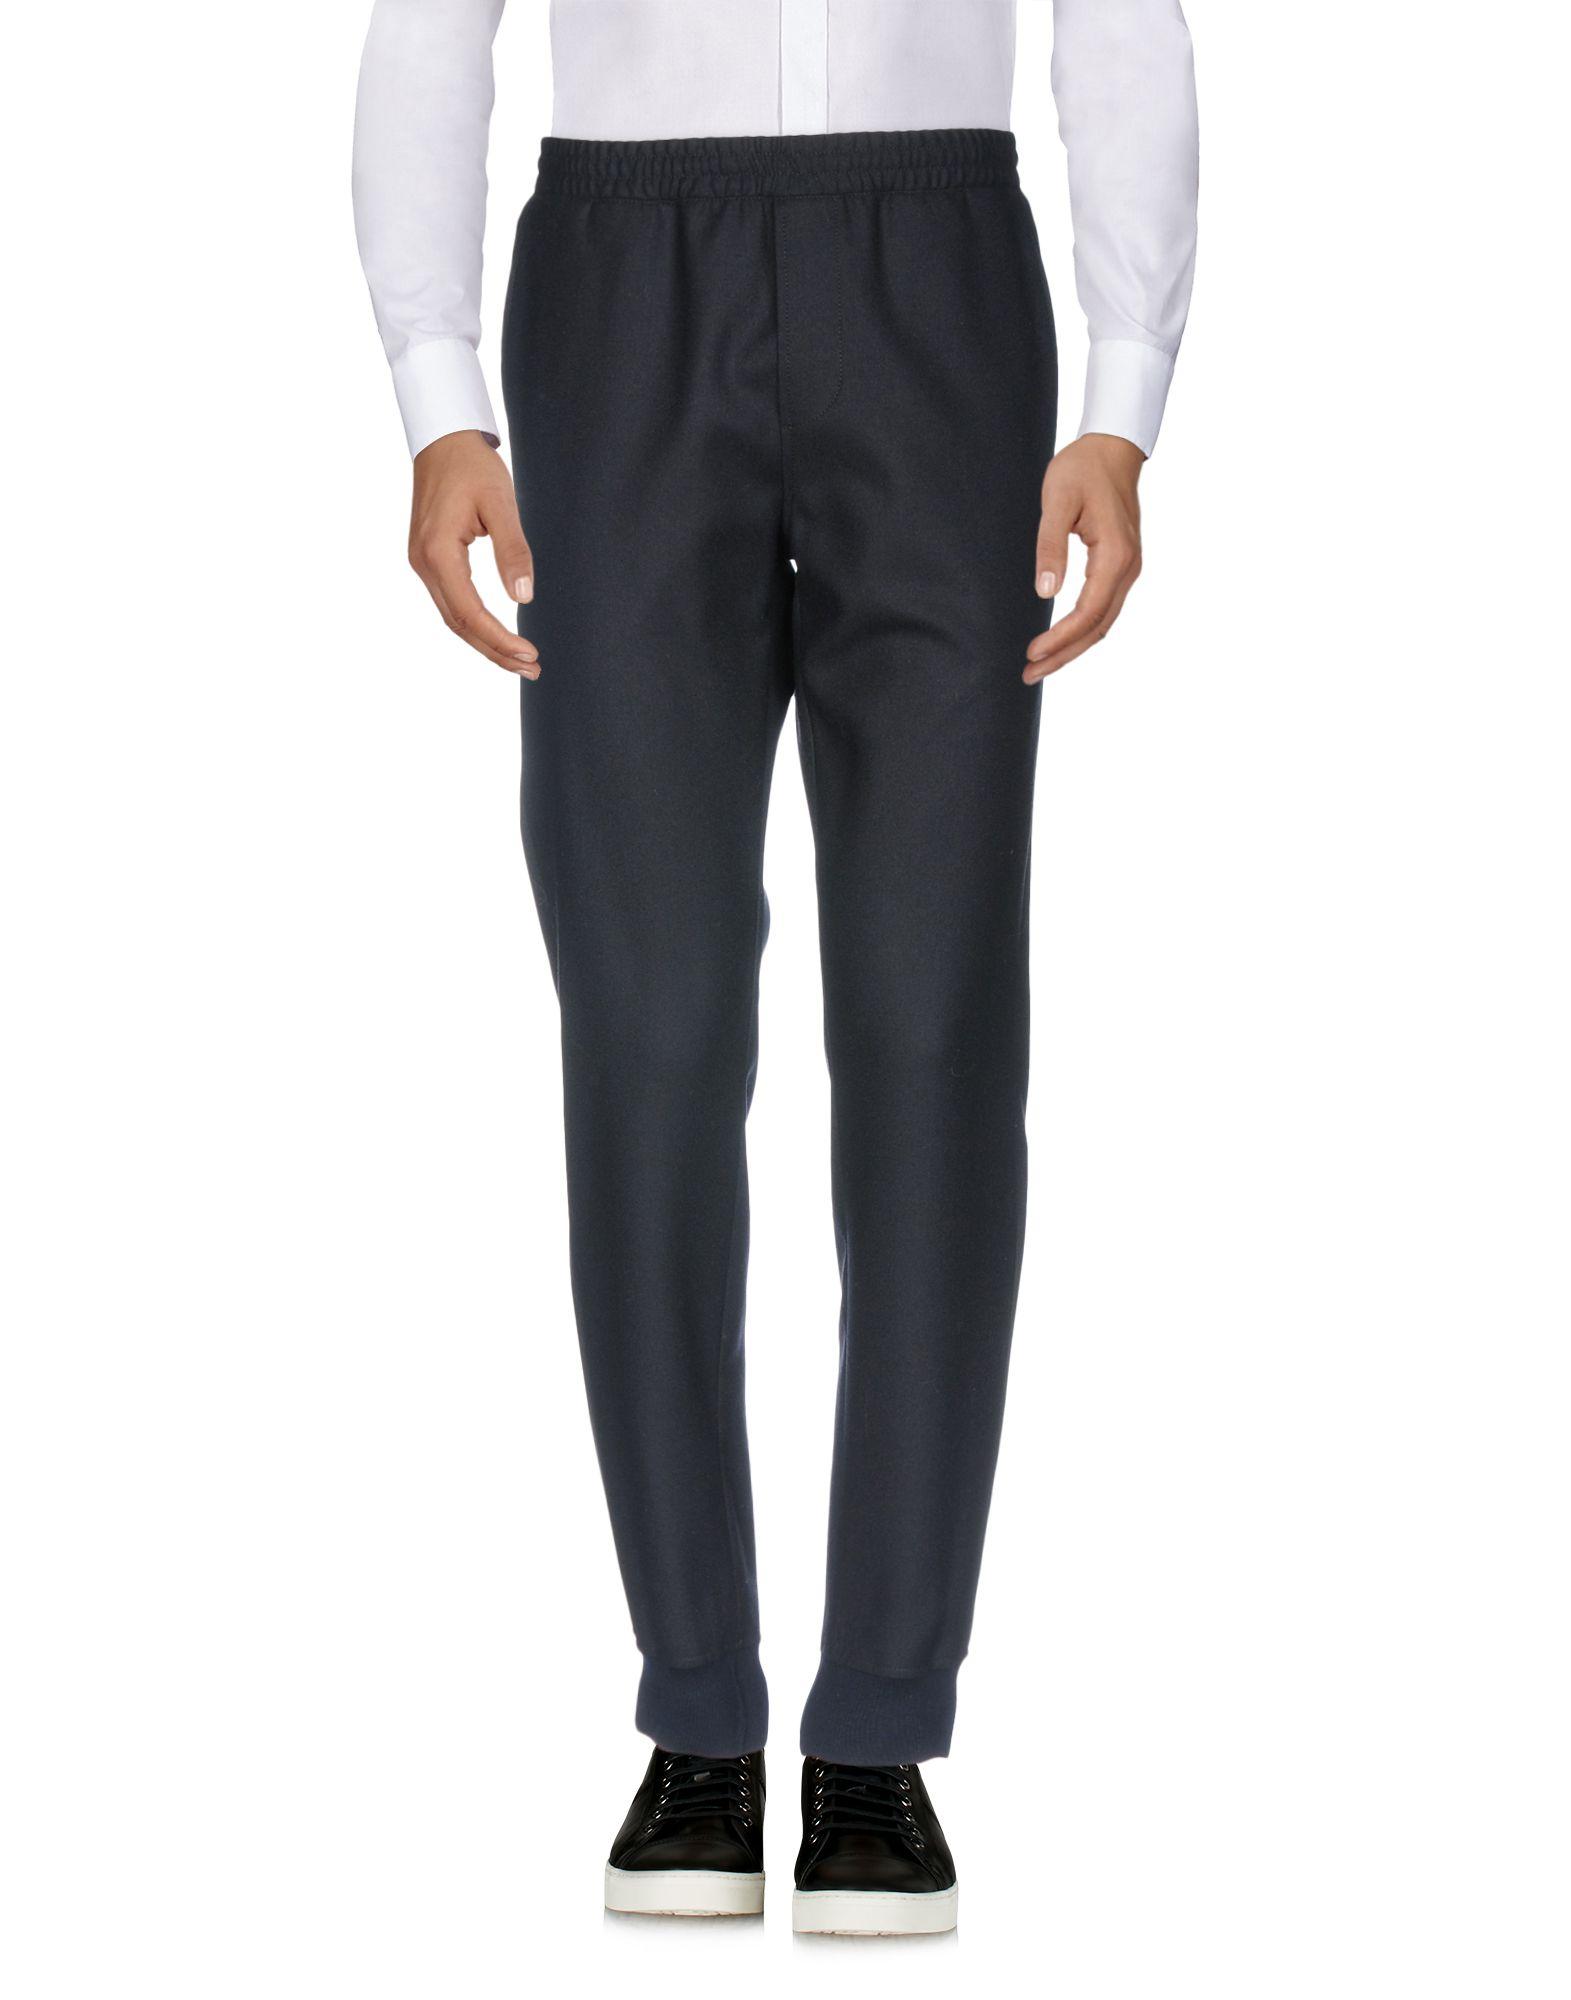 Pantalone Seventy Sergio Tegon Uomo - 13175325FH 13175325FH 13175325FH 7ed313